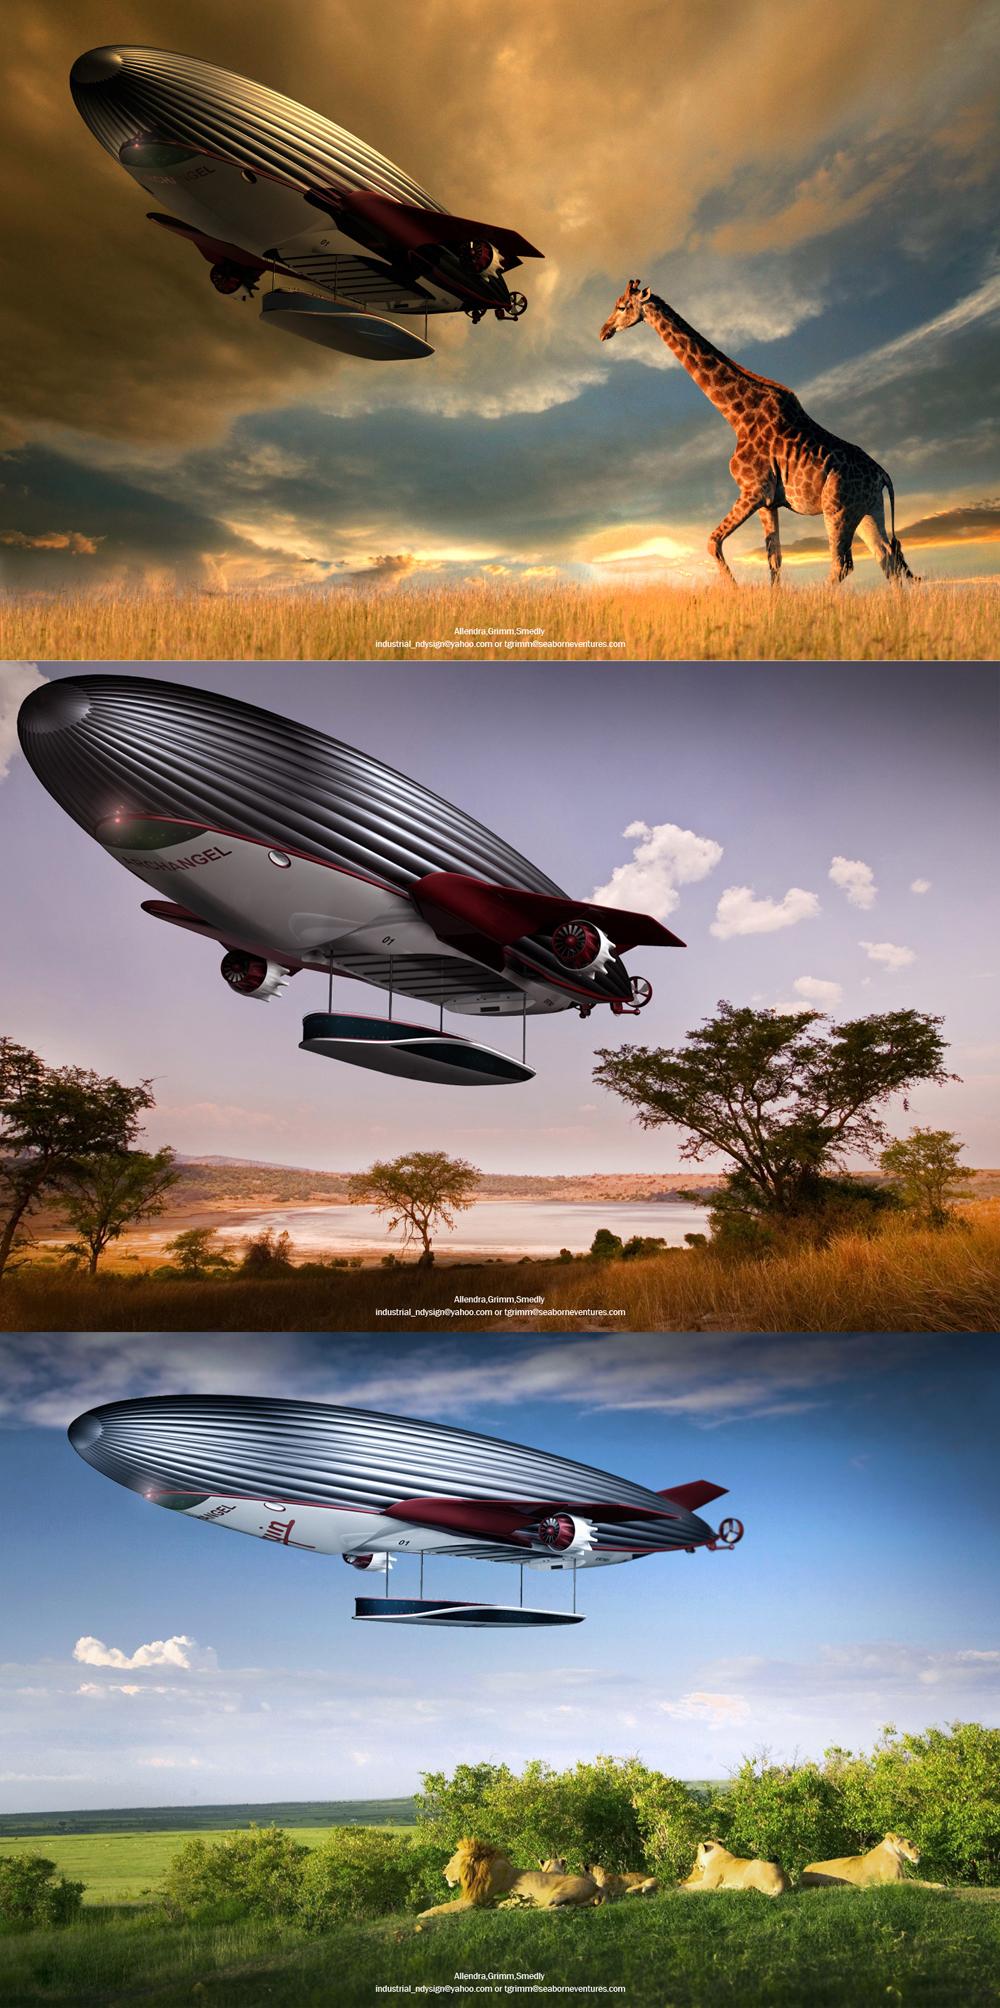 airship energy future cruising air aviation luxury